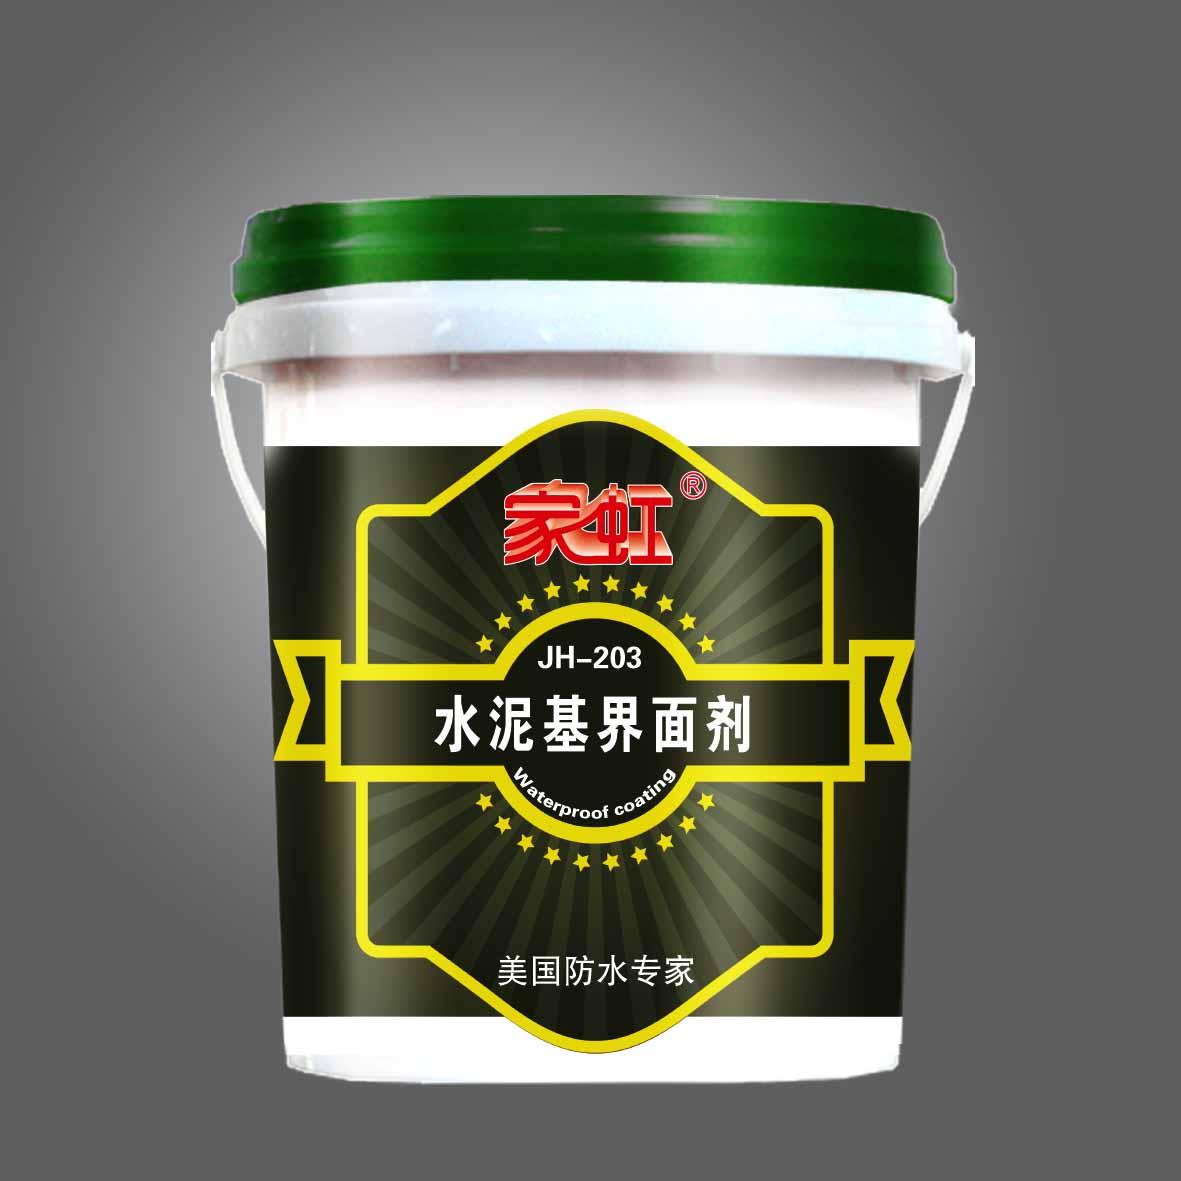 JH-203水泥基界面剂纯粉料详细说明